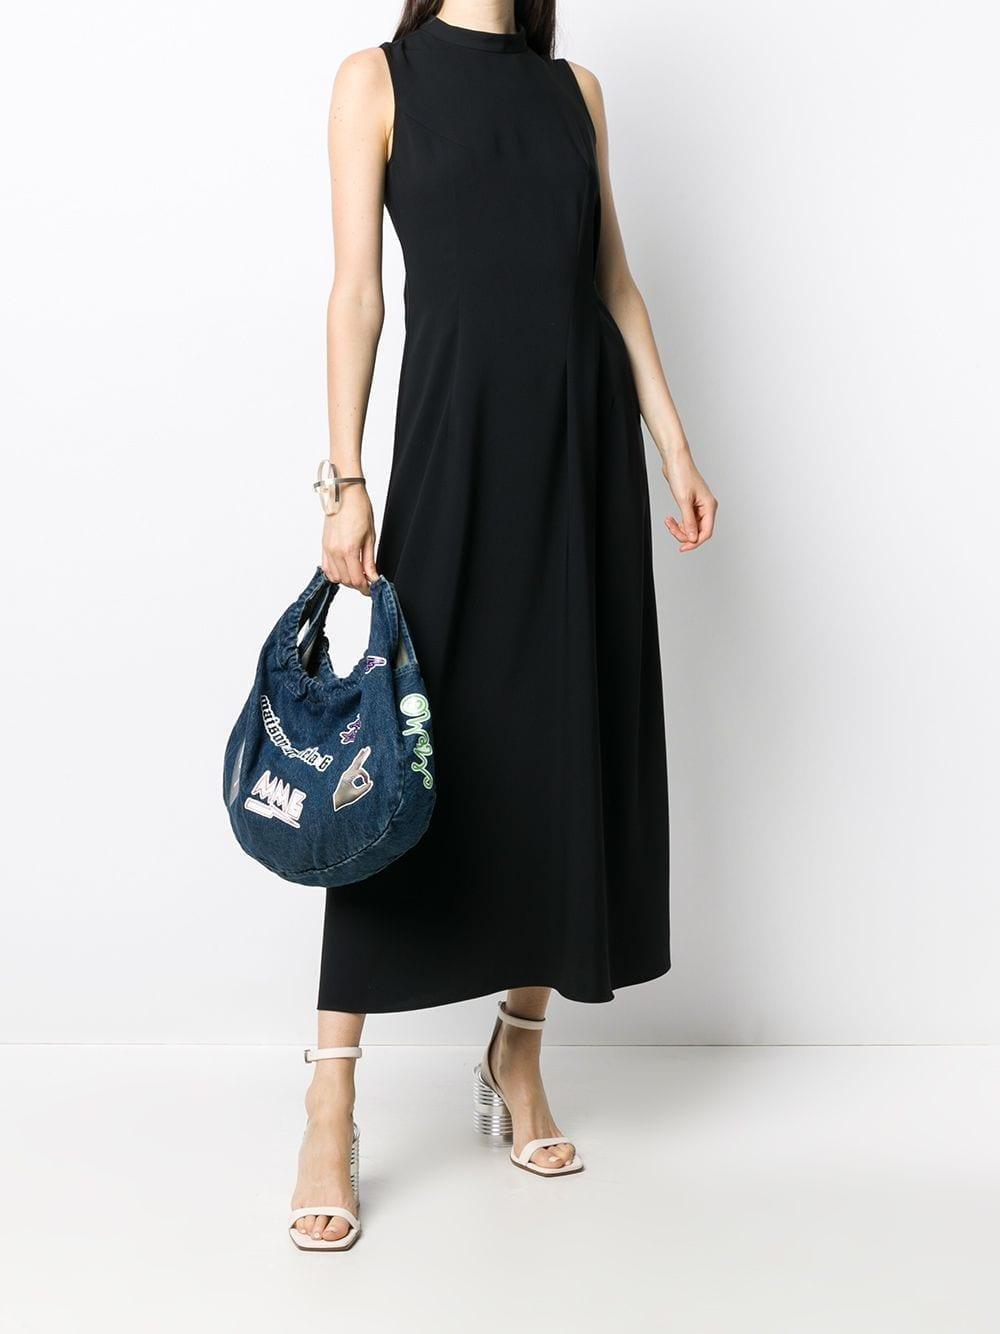 MM6 MAISON MARGIELA Sleeveless Pleated Details Dress